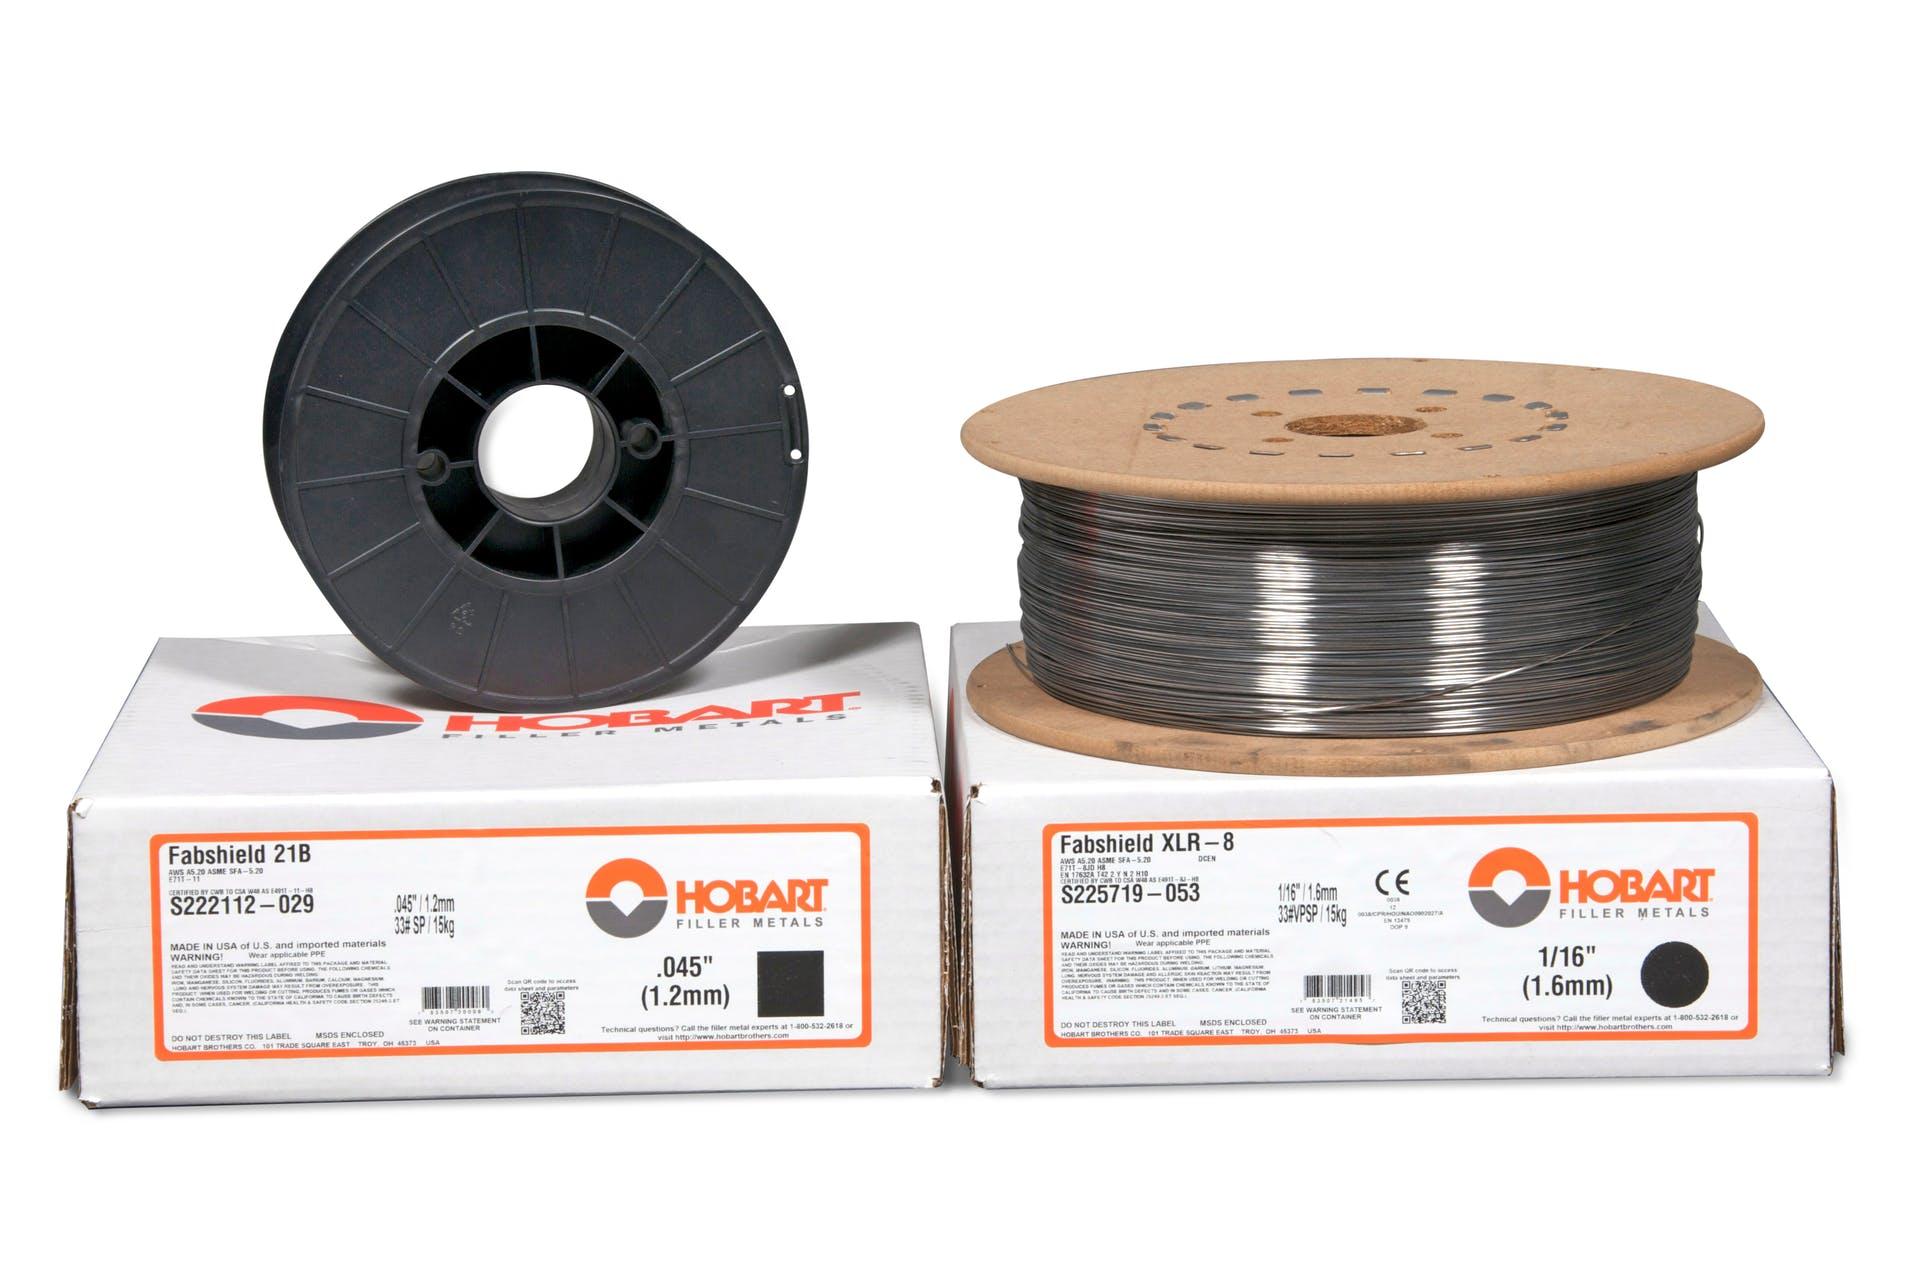 HOBART Fabshield Xlr-8 Welding Wire